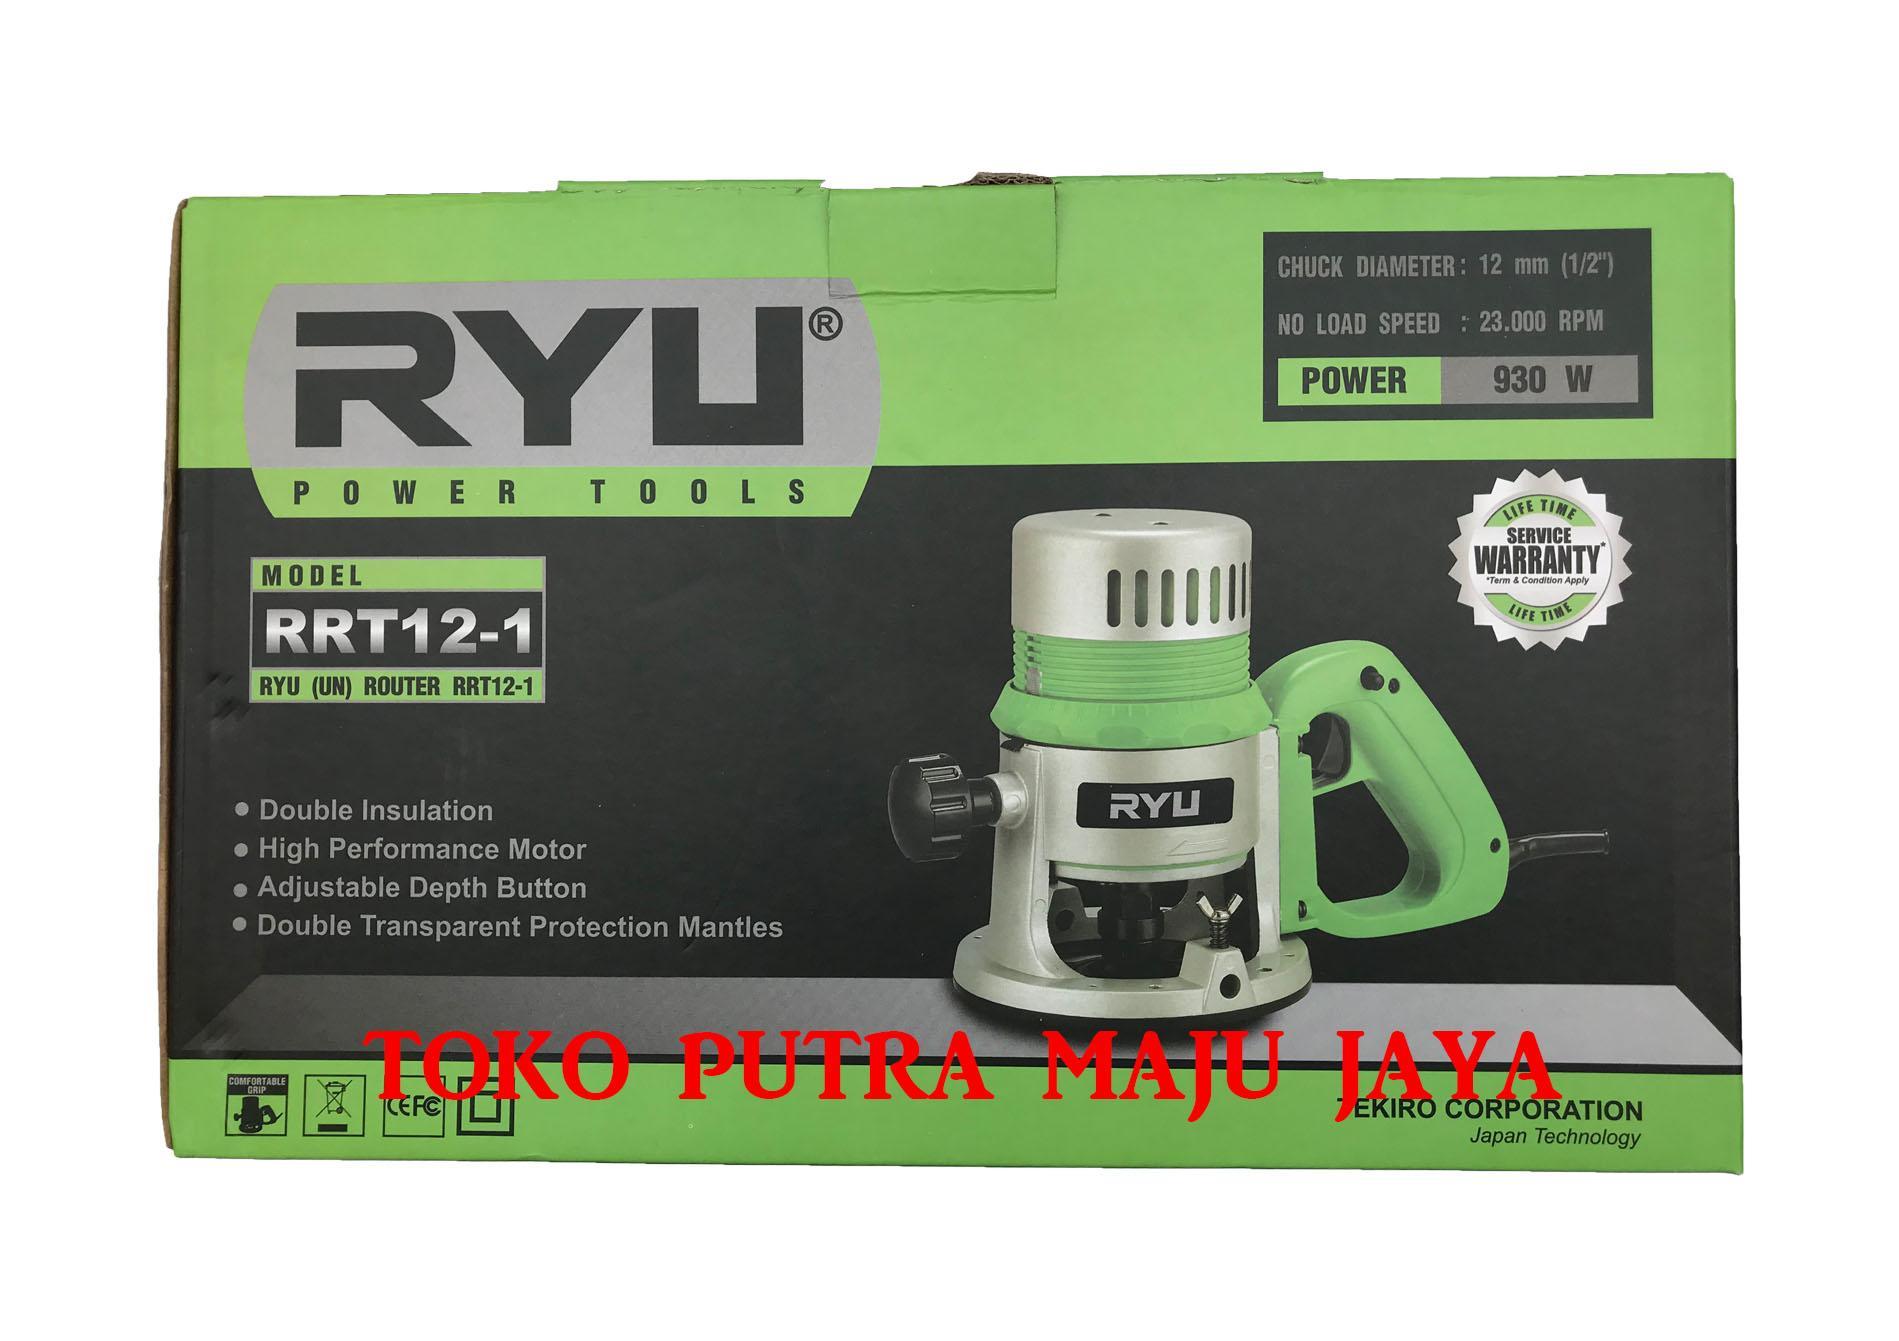 ... TEKIRO RYU ROUTER / MESIN PROFIL KAYU 23.000 RPM / 12 mm (RRT 12 -